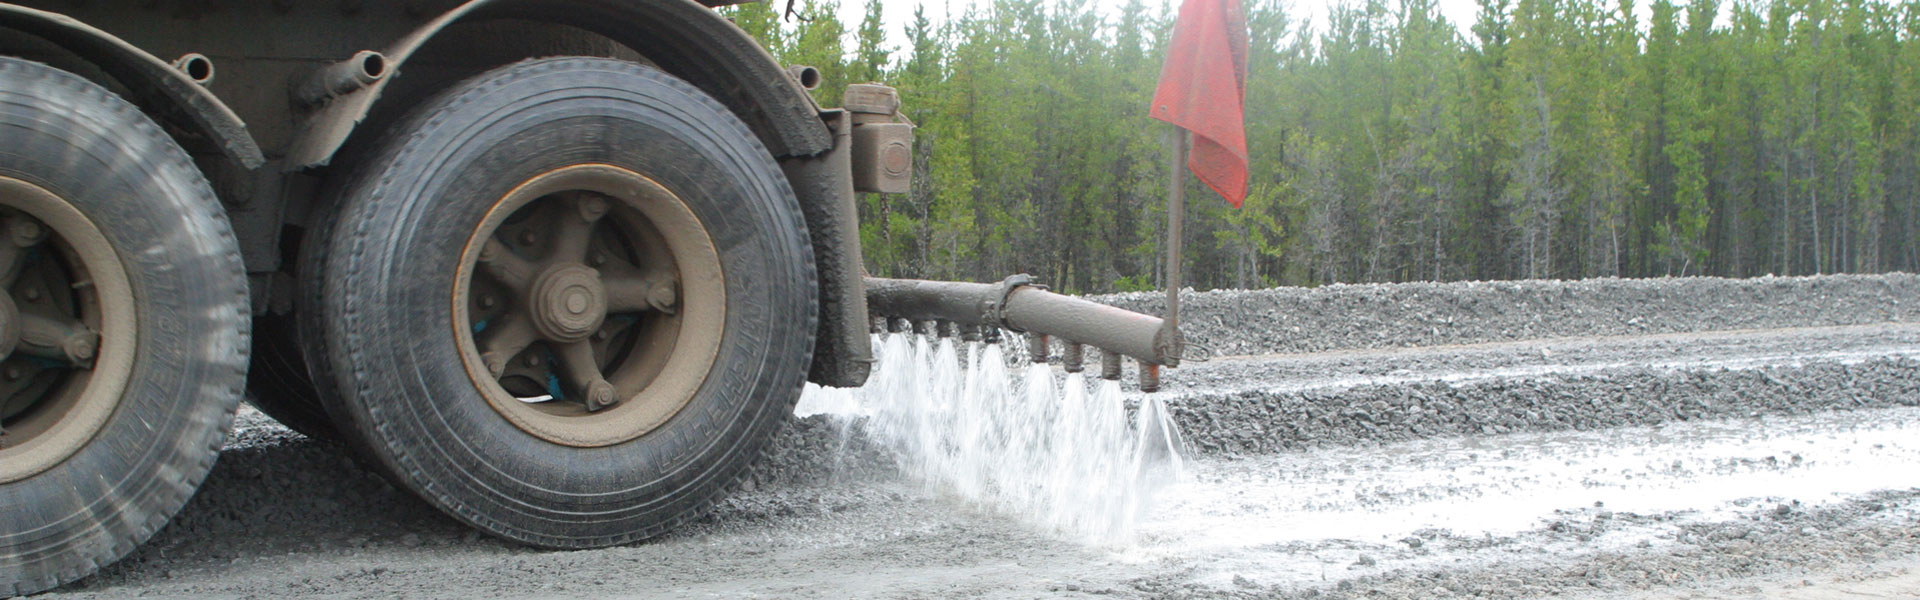 liquid-solutions-inc-dustcontrol-products-grand-rapids-mi_slide3